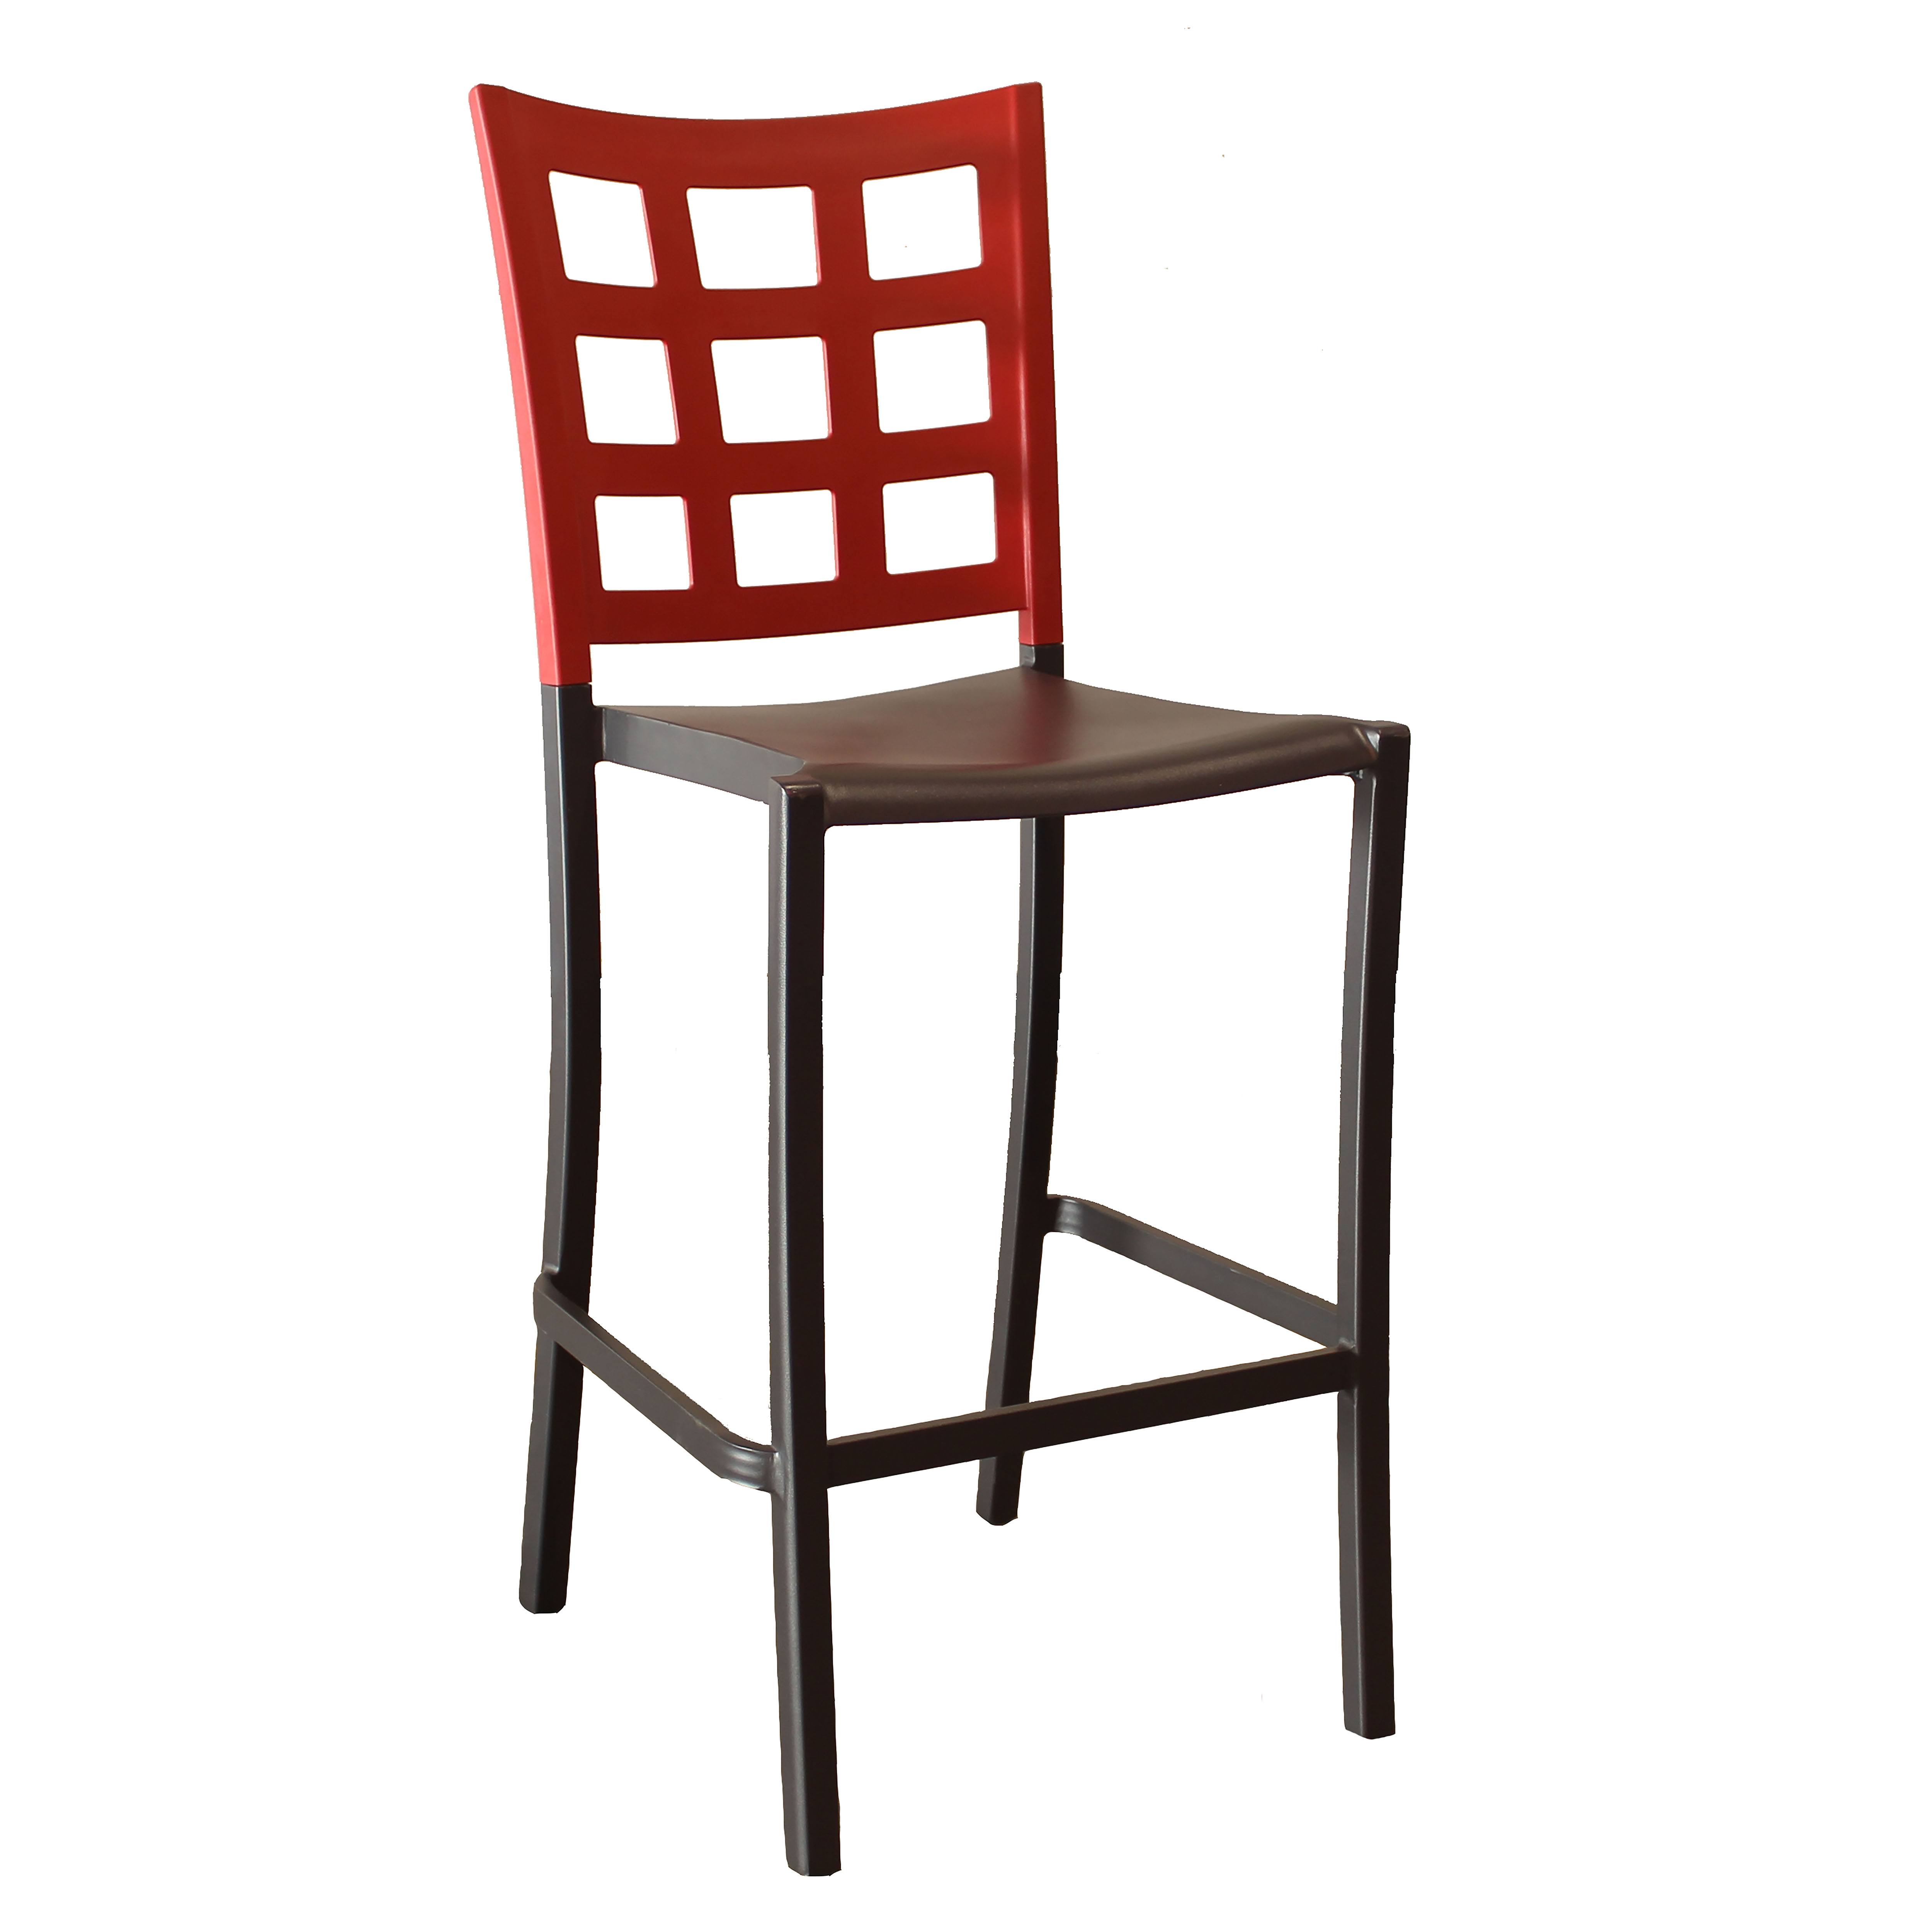 Grosfillex US640202 bar stool, stacking, indoor